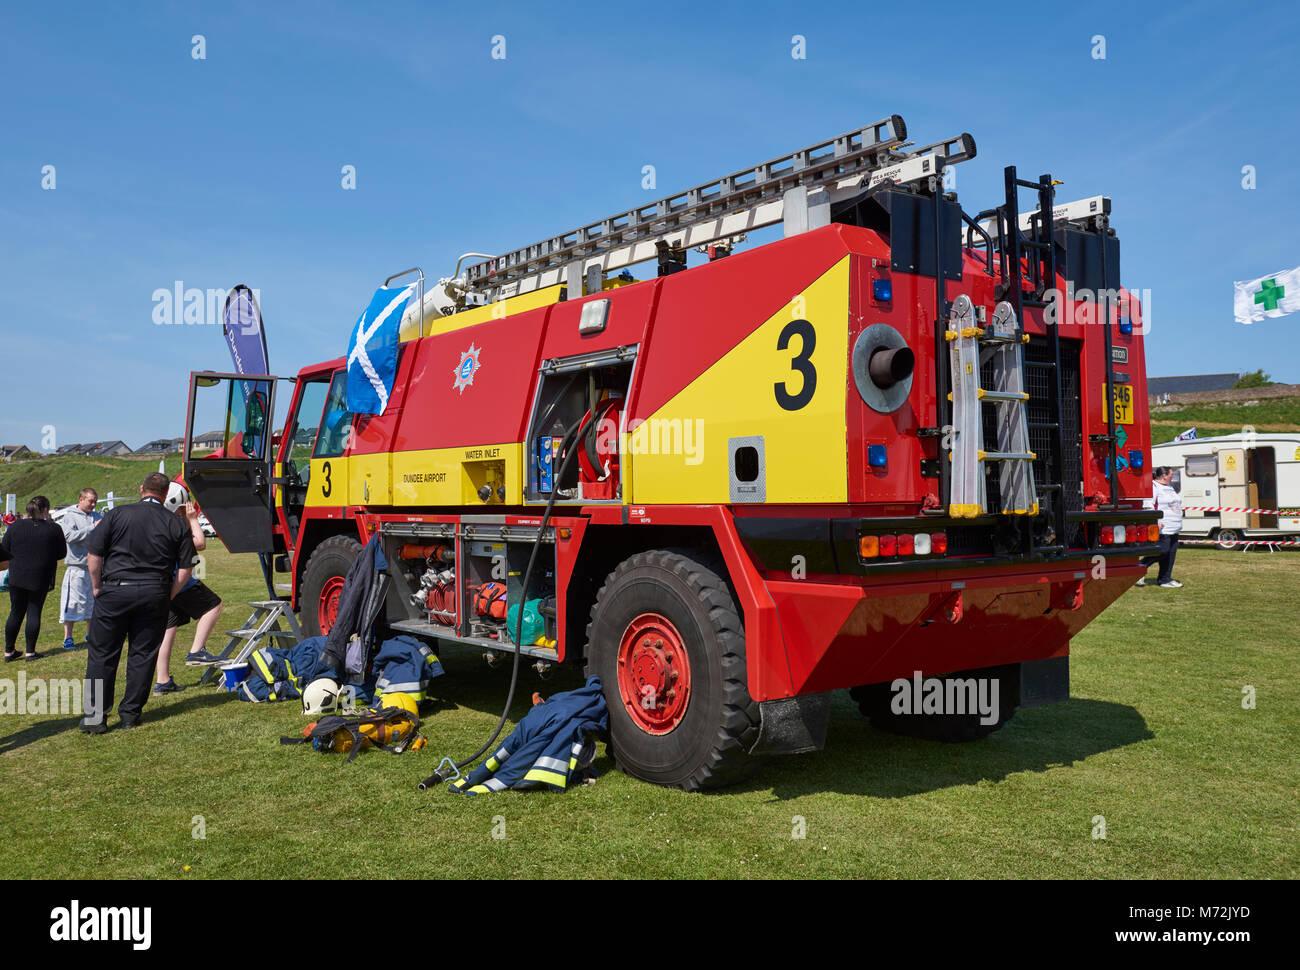 Airport Fire Truck Stock Photos & Airport Fire Truck Stock